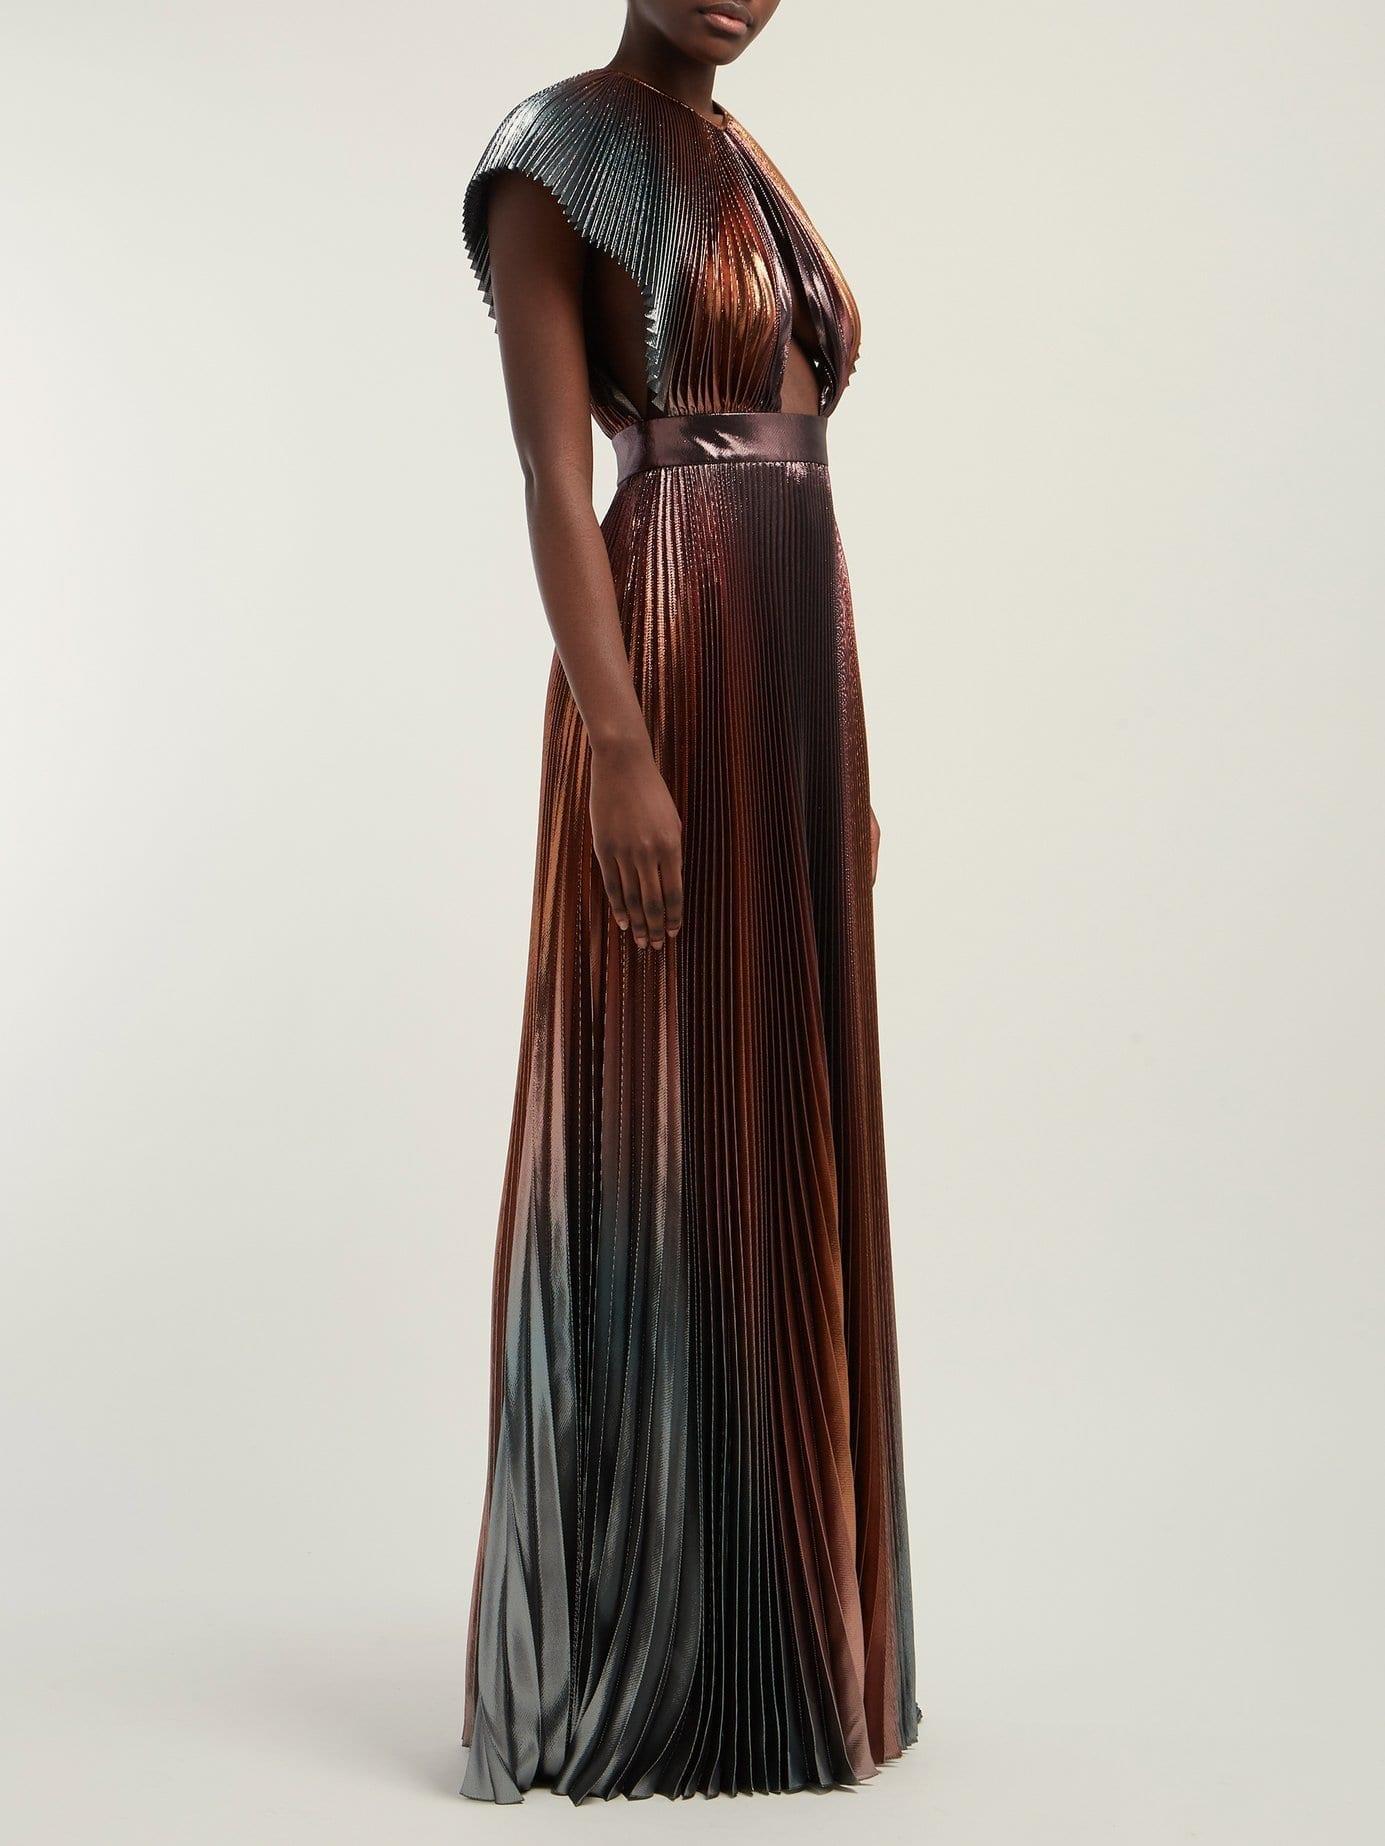 8606883871 GIVENCHY Metallic Pleated Silk-blend Metallic Bronze Gown. GIVENCHY  Metallic Pleated Silk-blend Metallic Bronze Gown